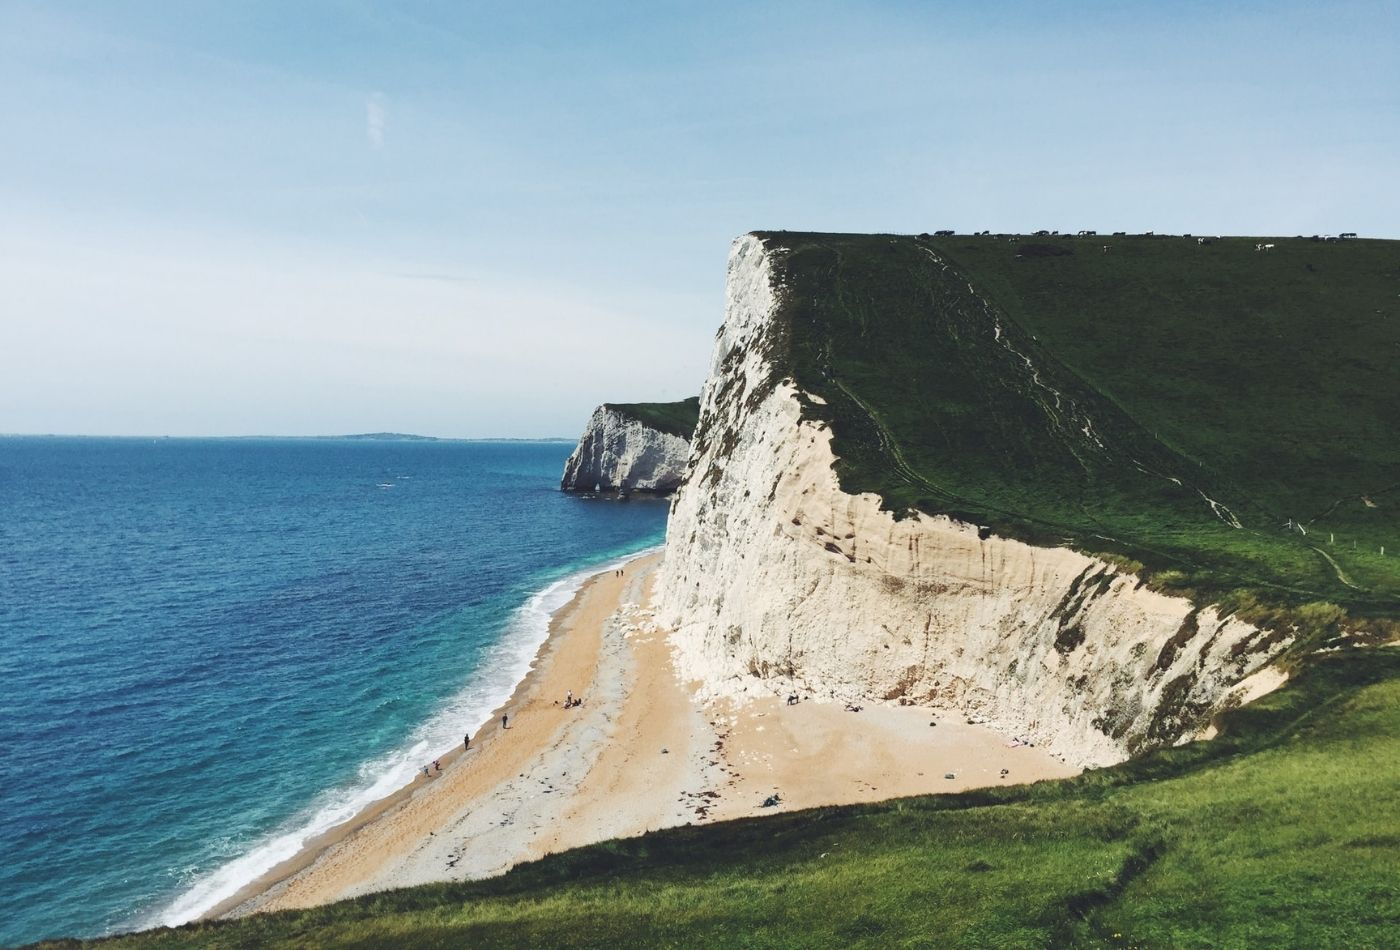 Winter Walk in Dorset along the Jurassic Coast